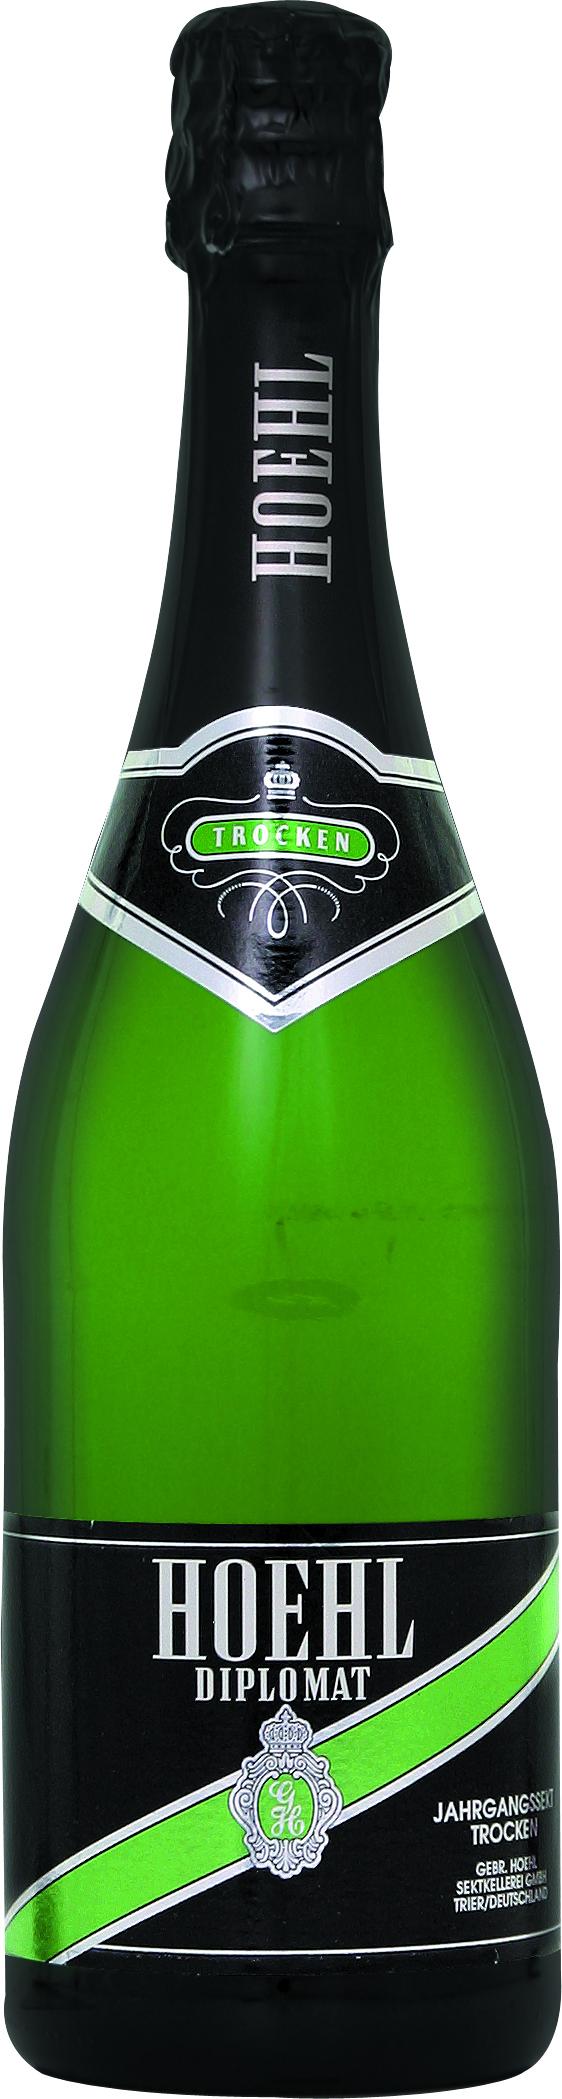 Sekt der Marke Hoehl Diplomat Trocken 10,5% 6-0,75l Flasche